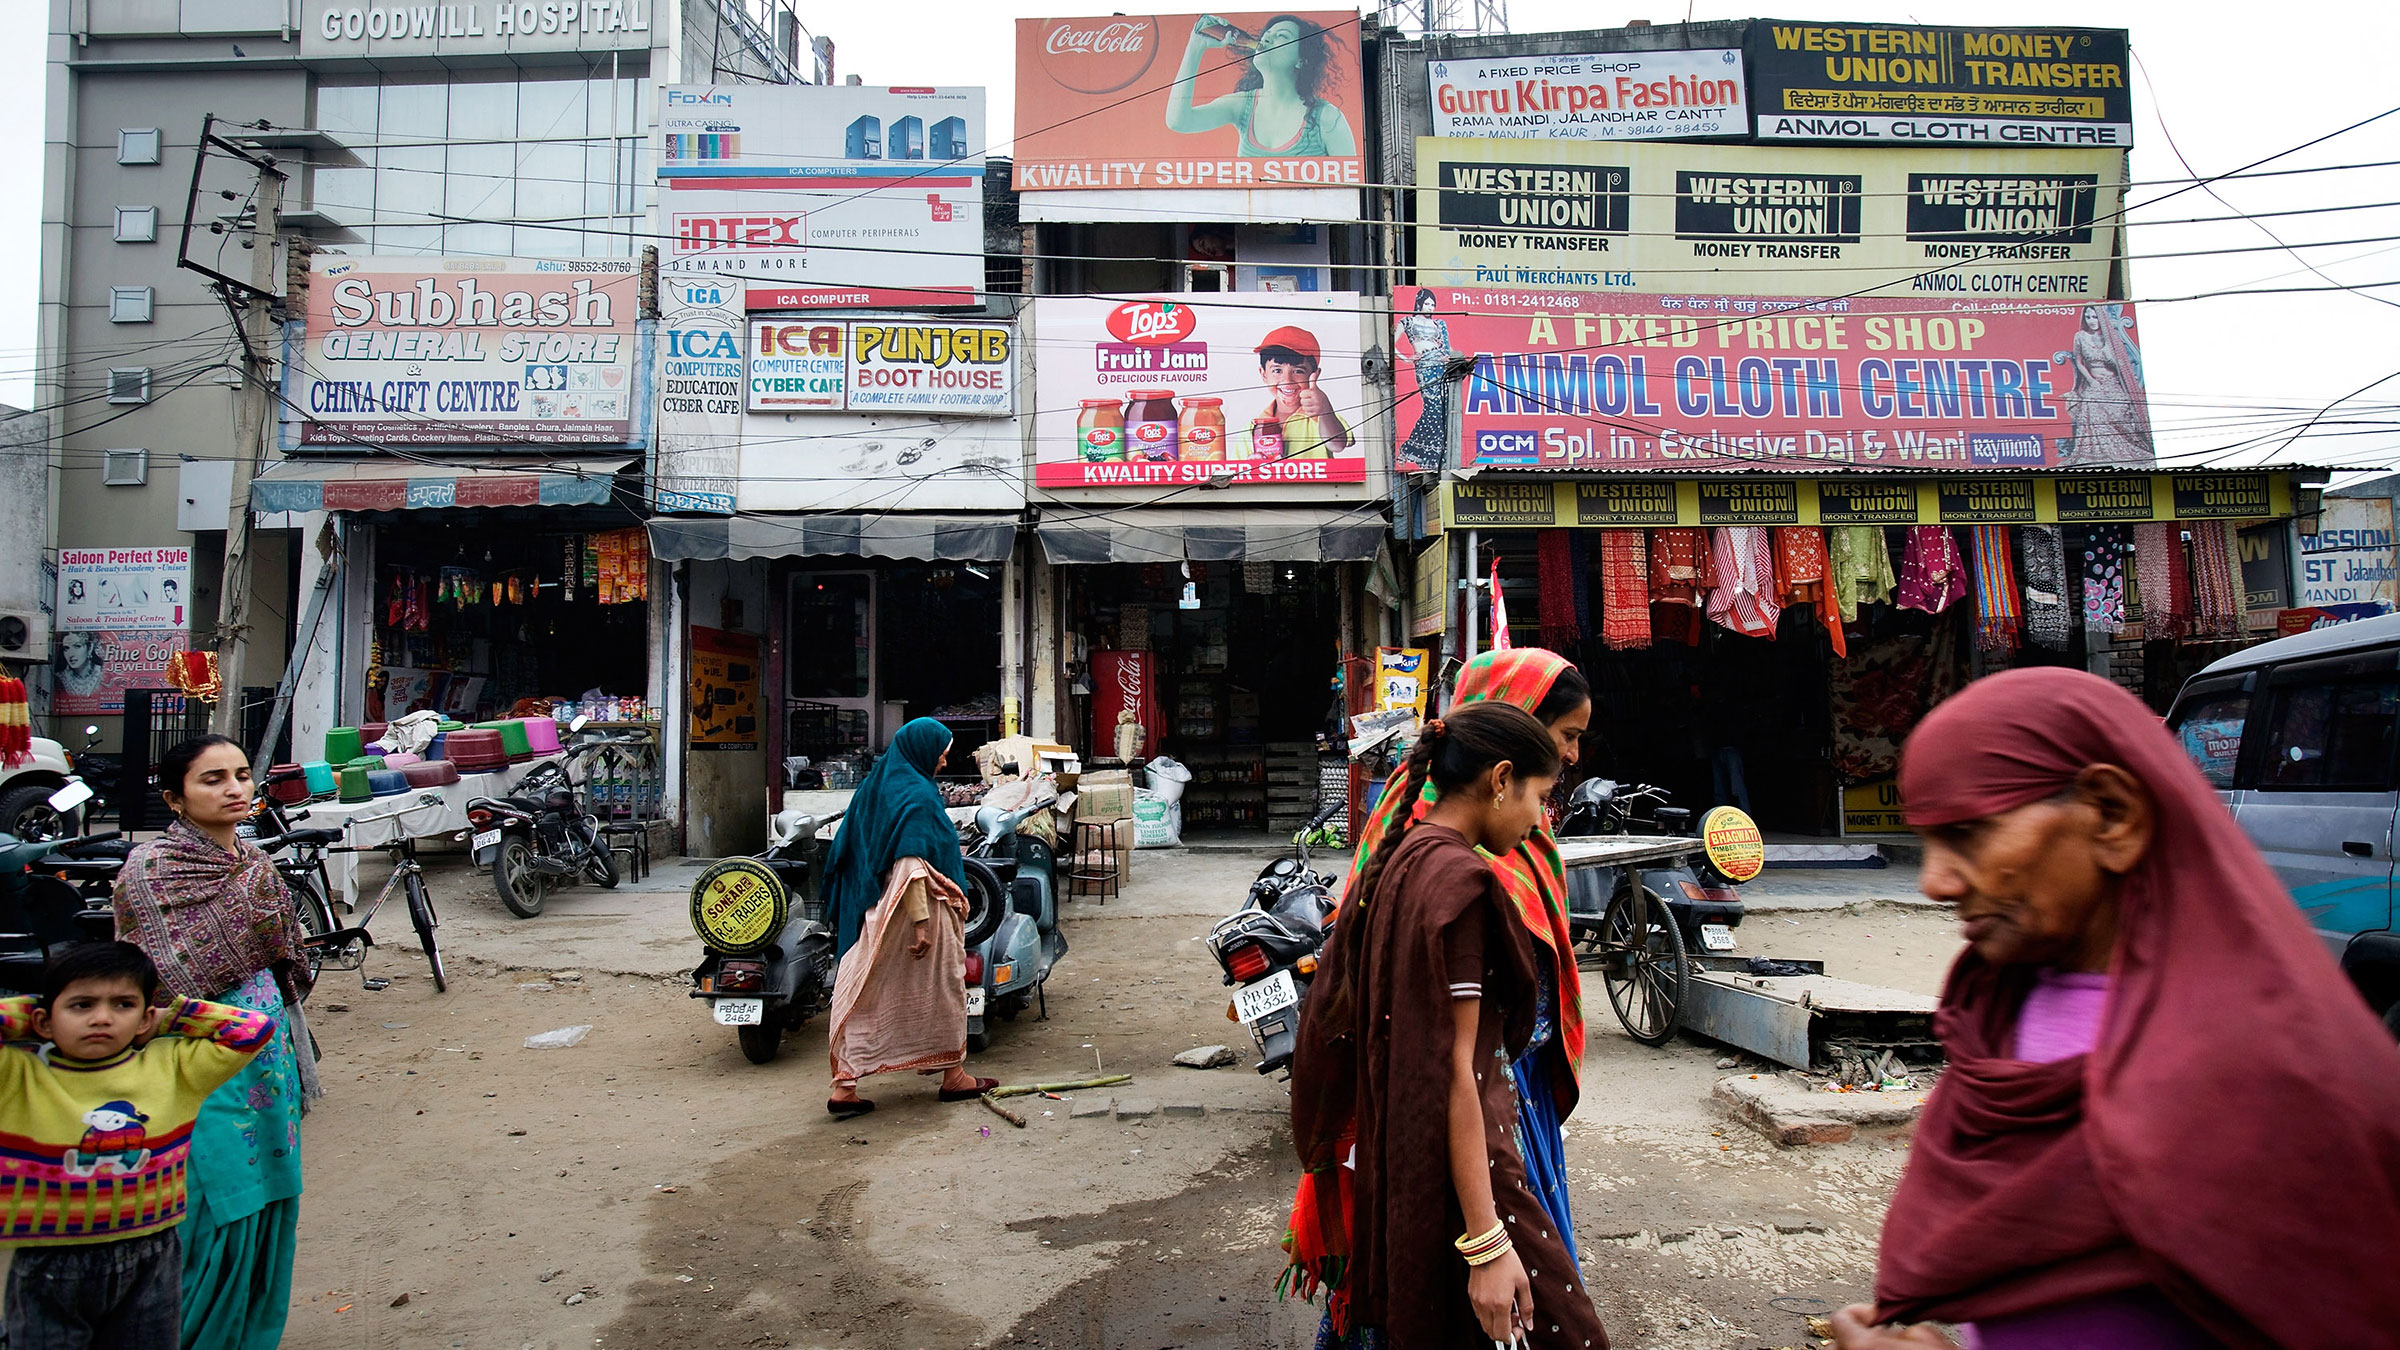 india-small-store-10162012-web